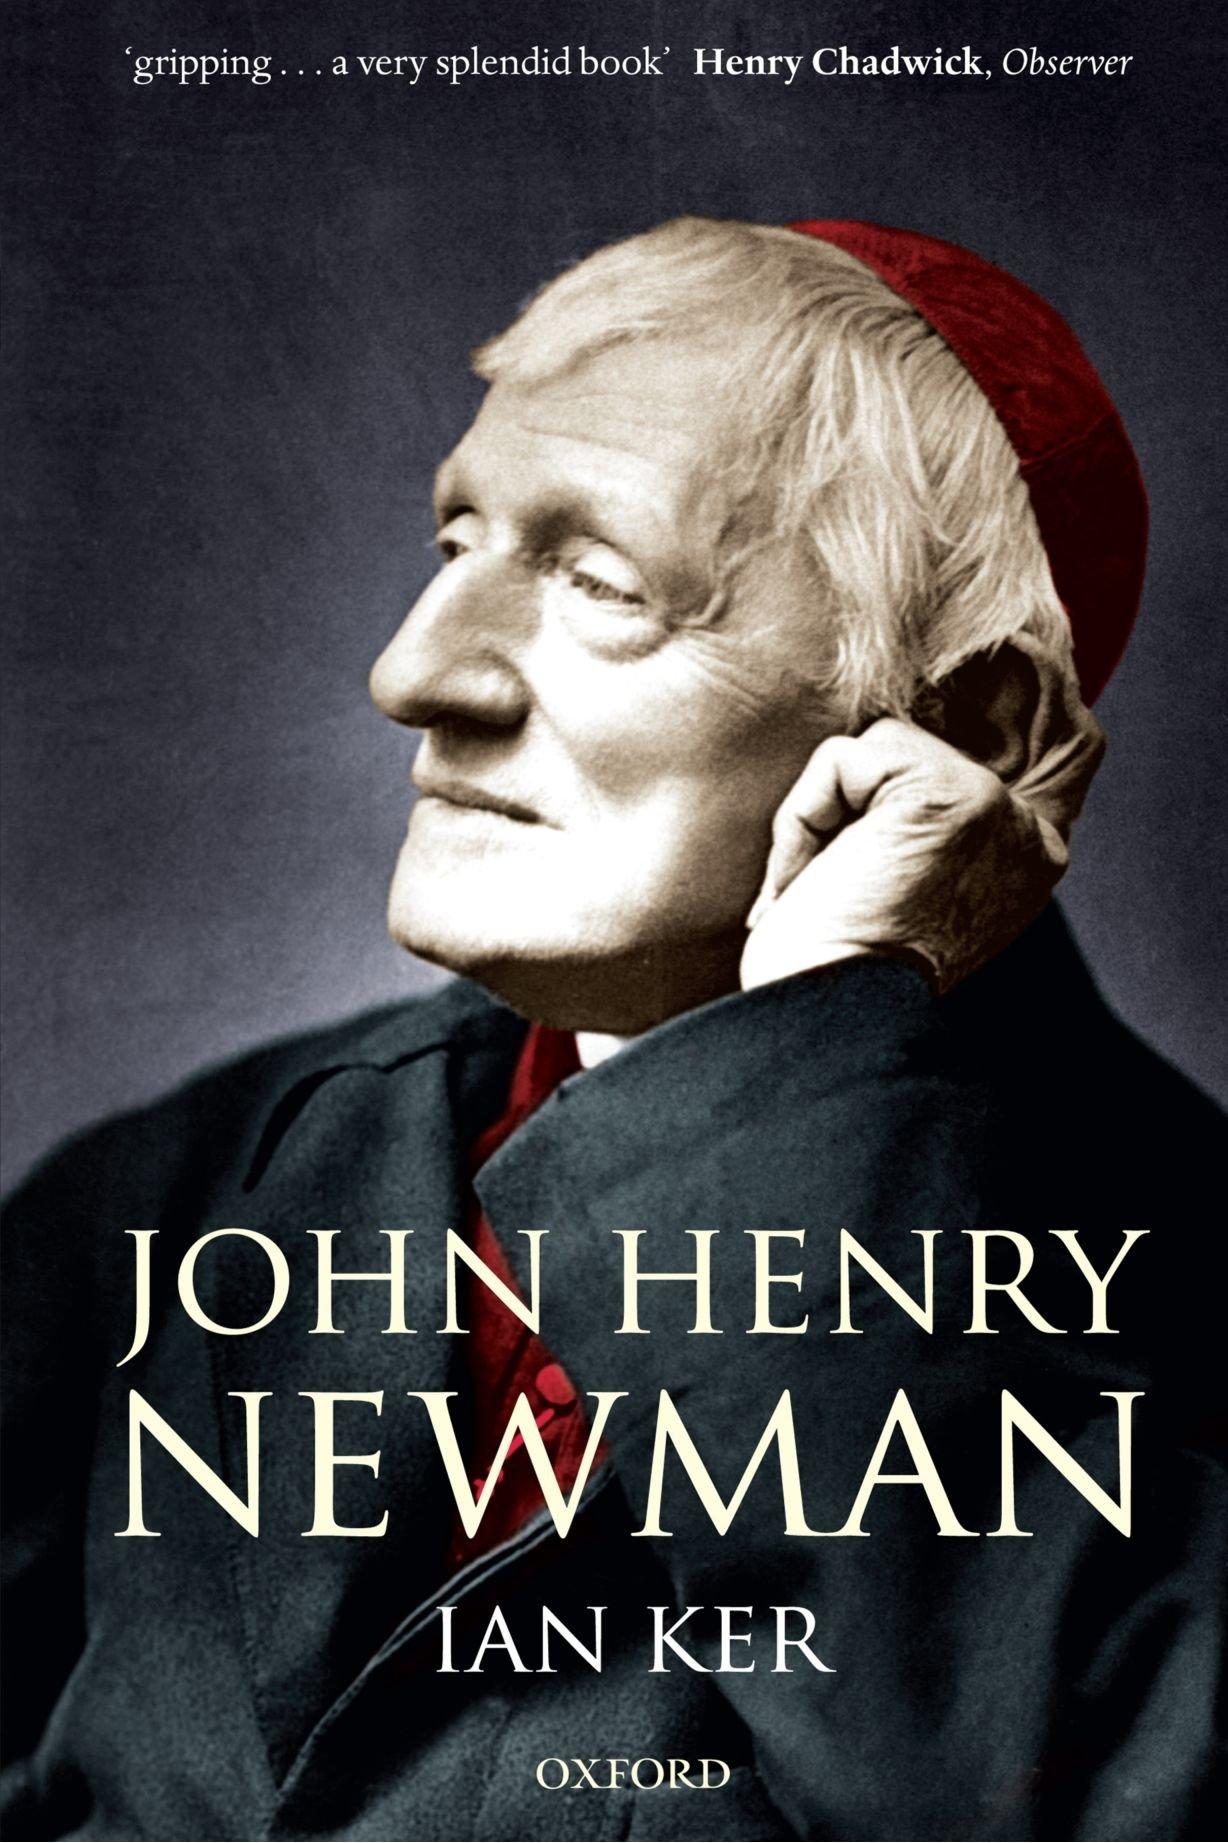 John Henry Newman: A Biography by Oxford University Press, USA